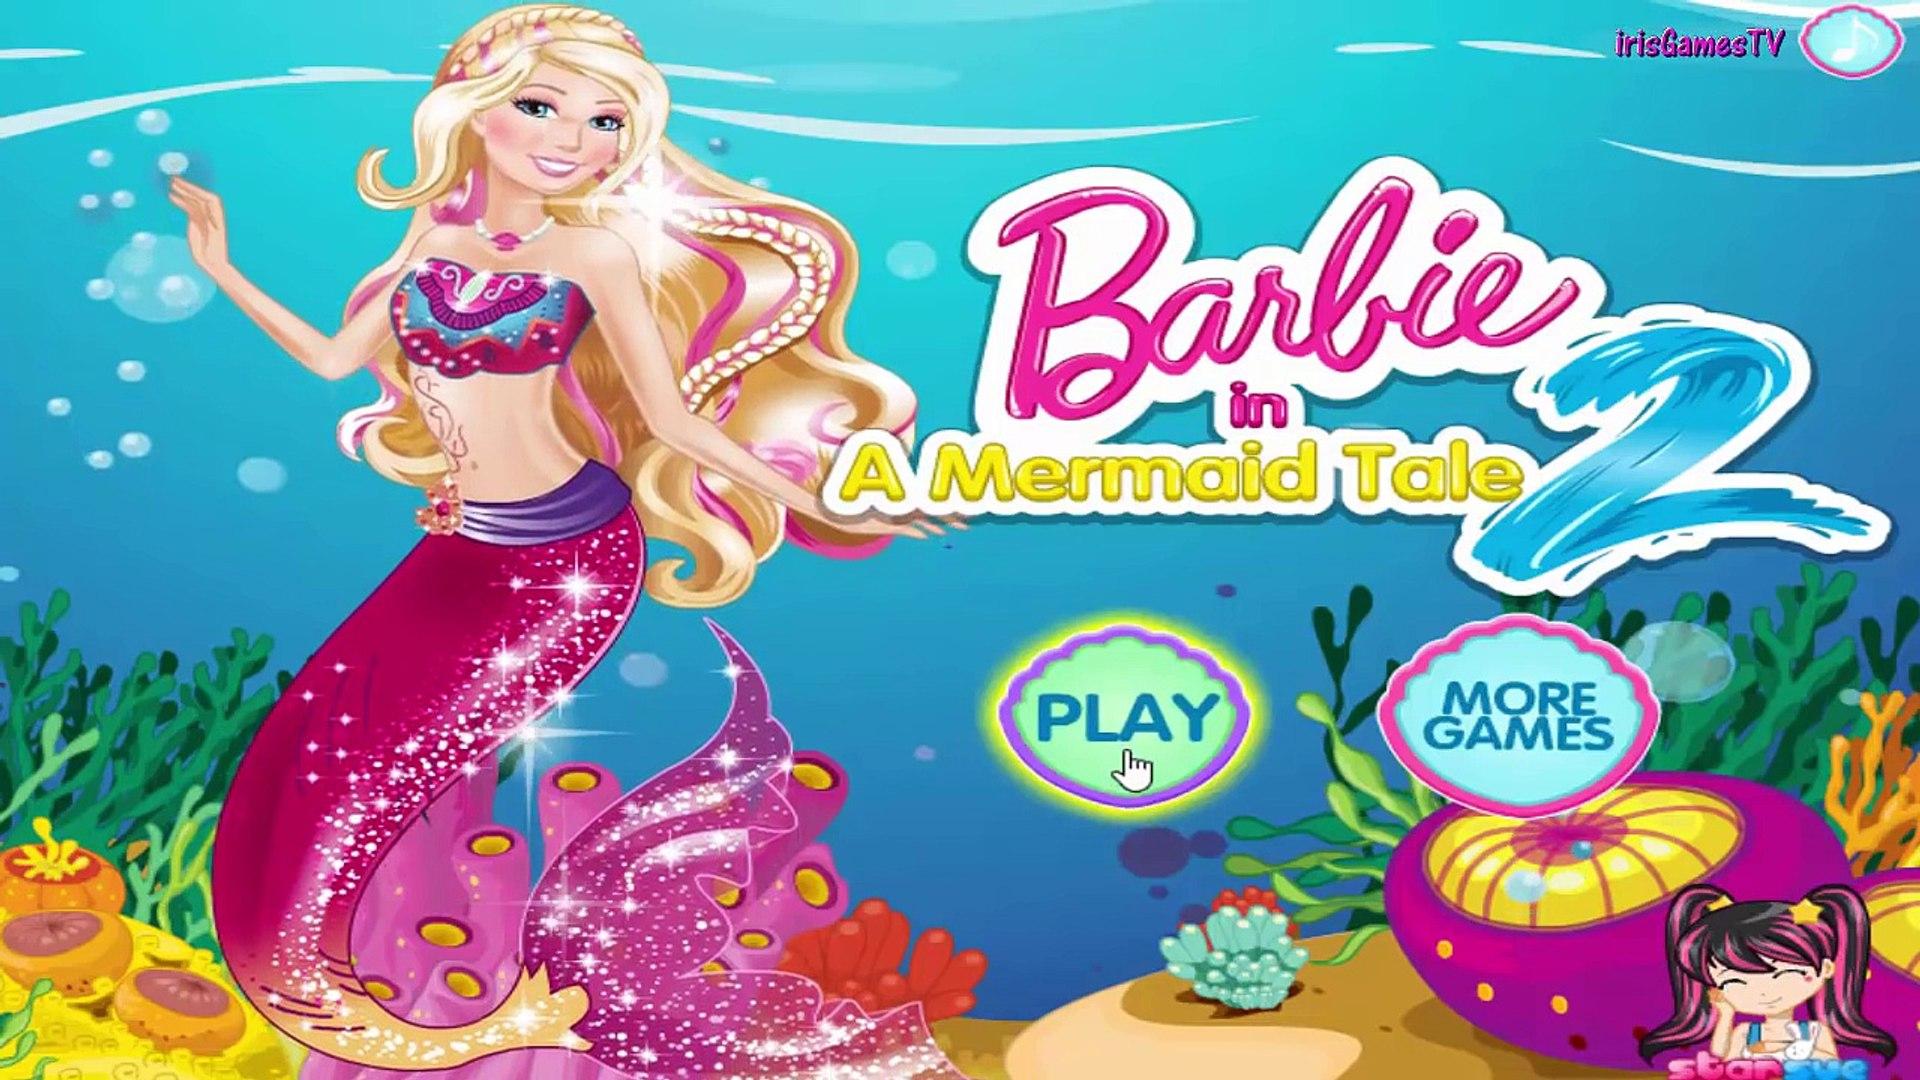 Mermaid tale 2 dress up games lac leamy casino theatre